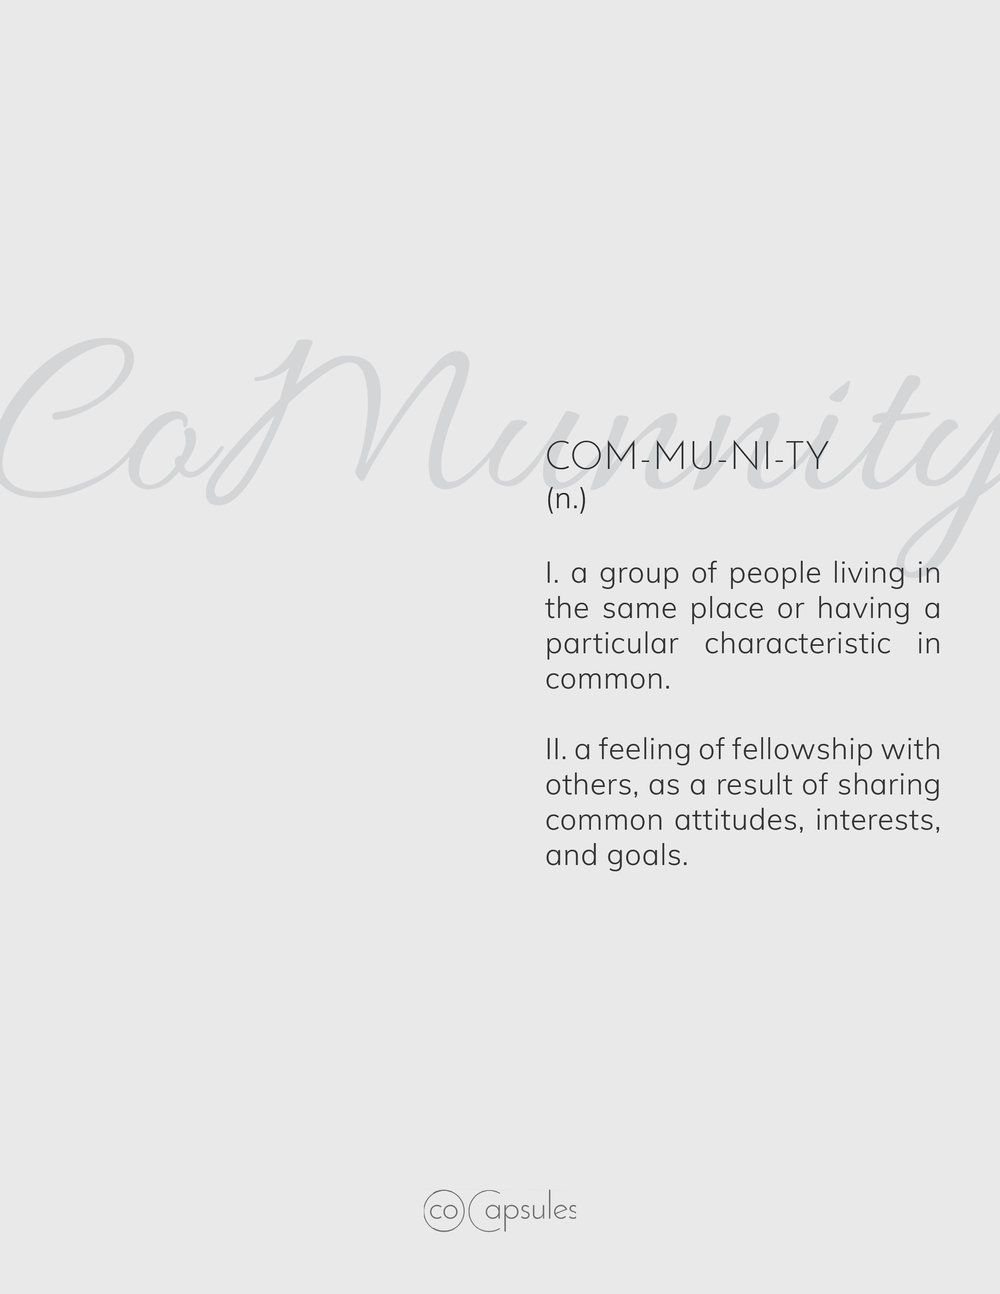 communityprintgray.jpg